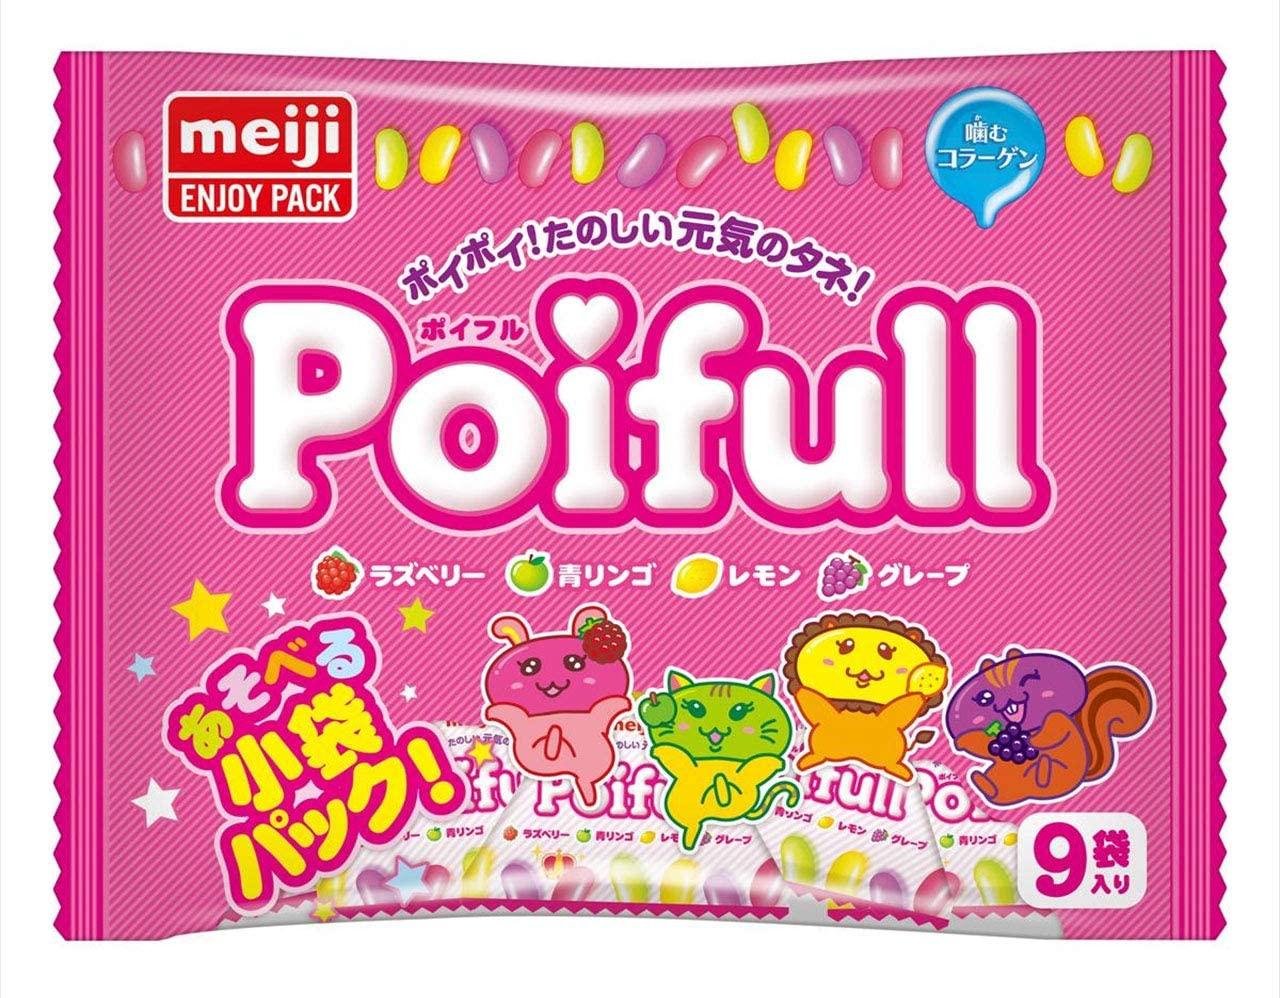 Meiji 明治 Polfull 水果風味雷根軟糖 126g(裡面有9小袋分裝喔!)